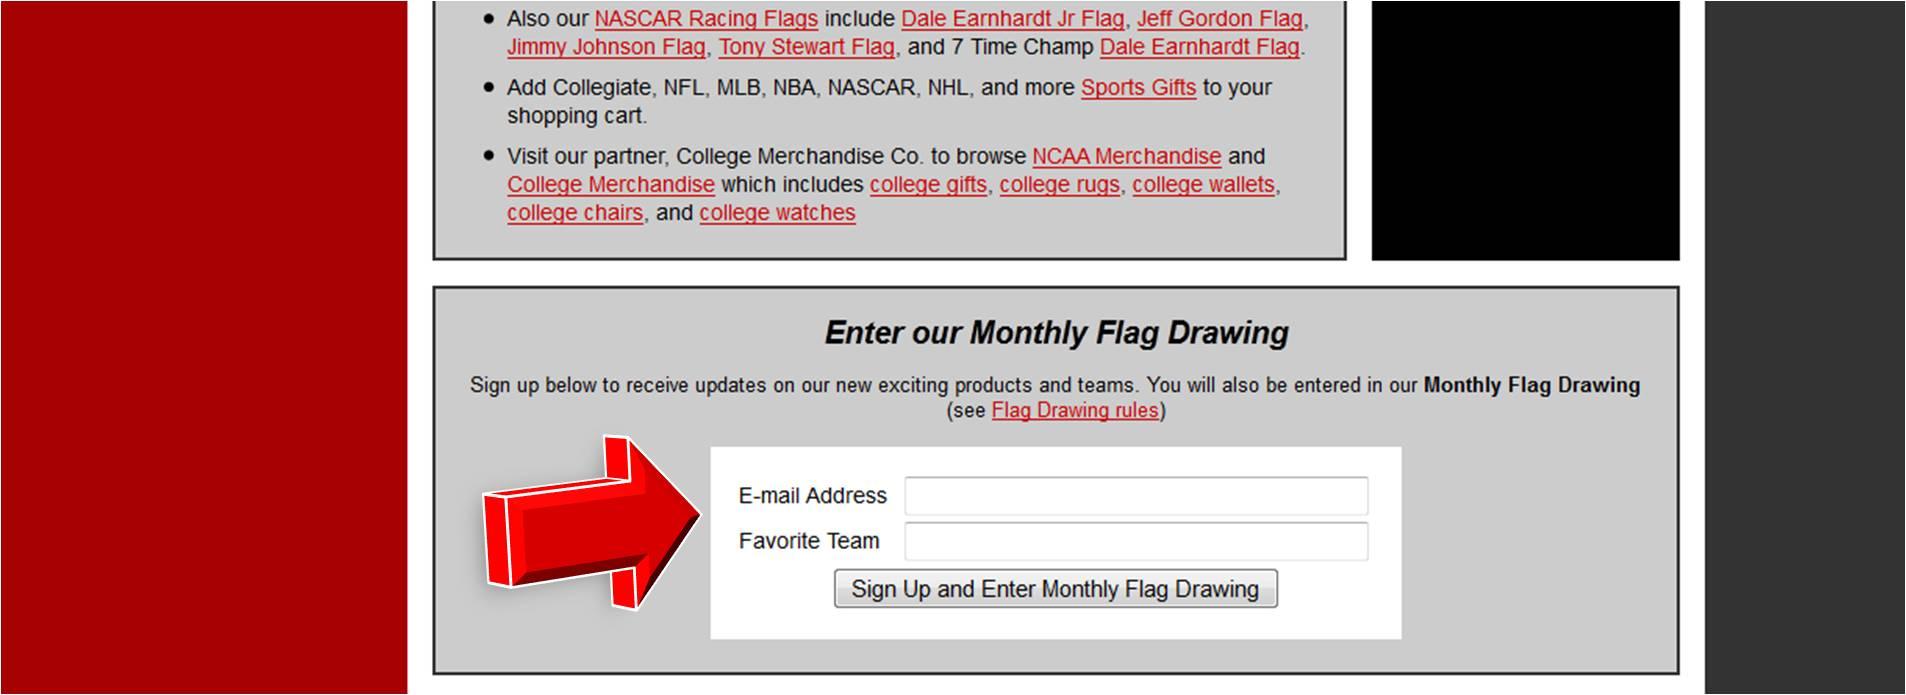 Sports flags pennants company coupon code - Genesis virgin